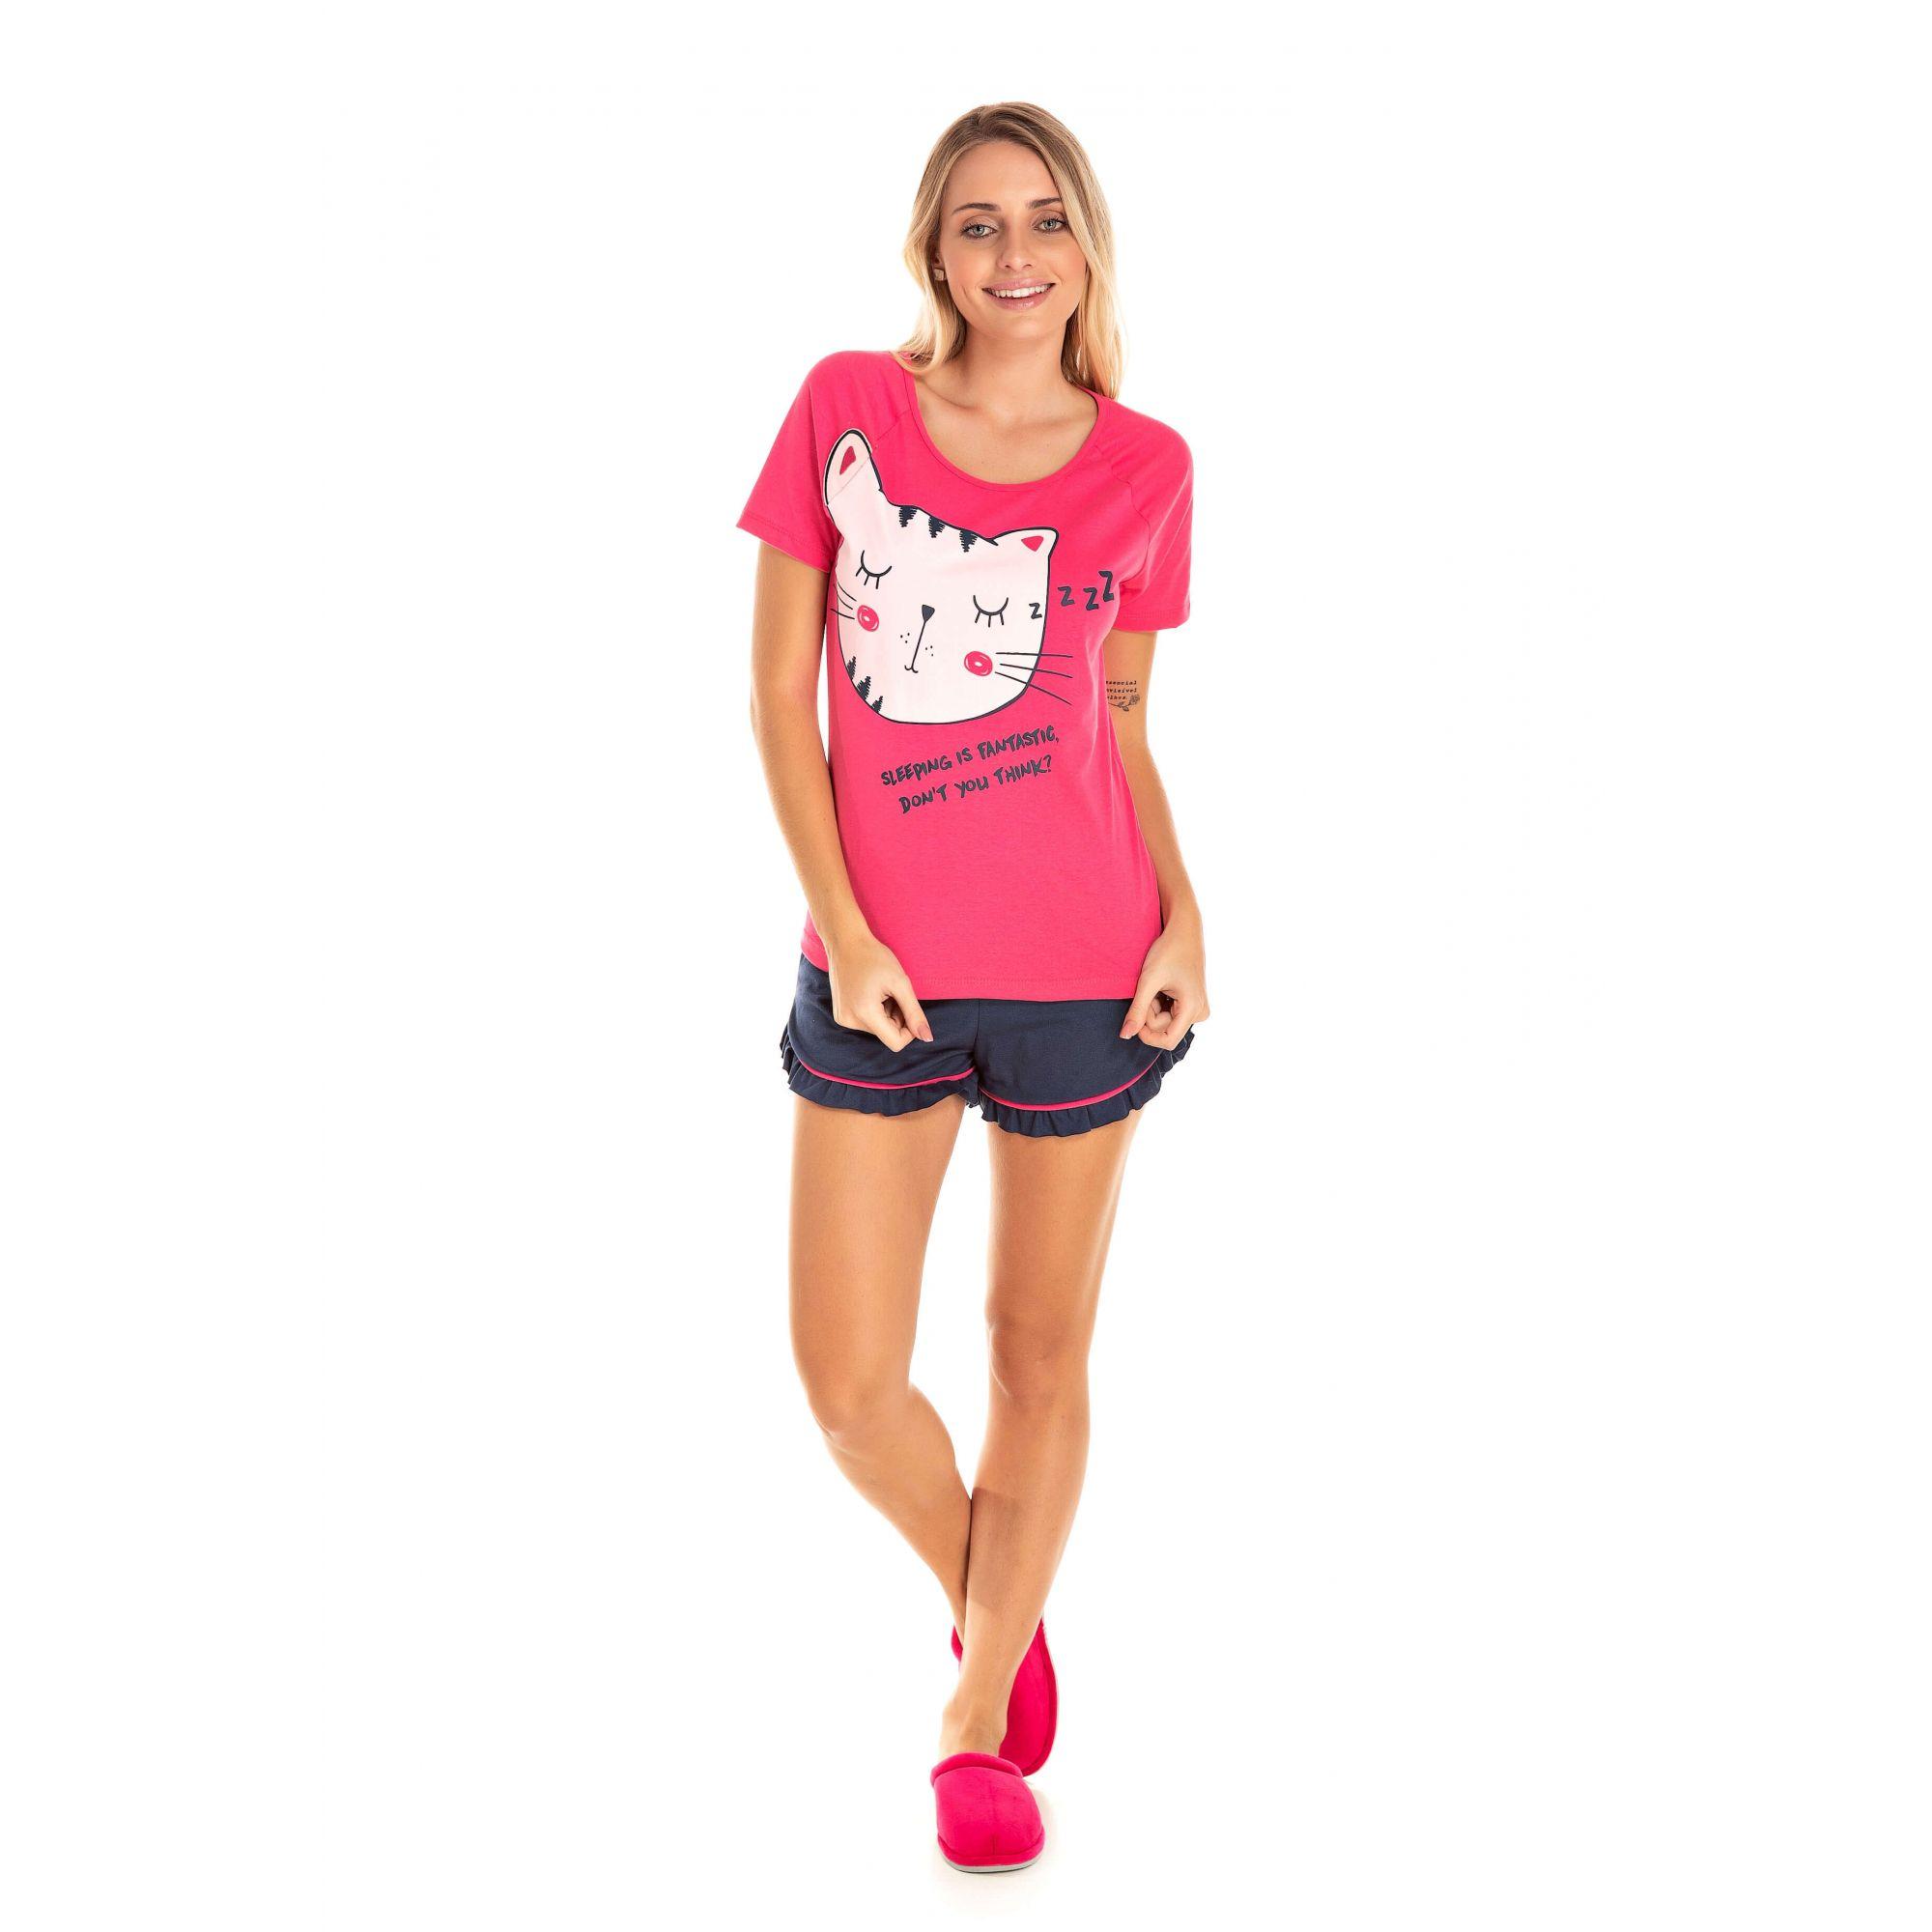 030 - Short Doll Adulto Feminino Gatinho Zzz - Pink